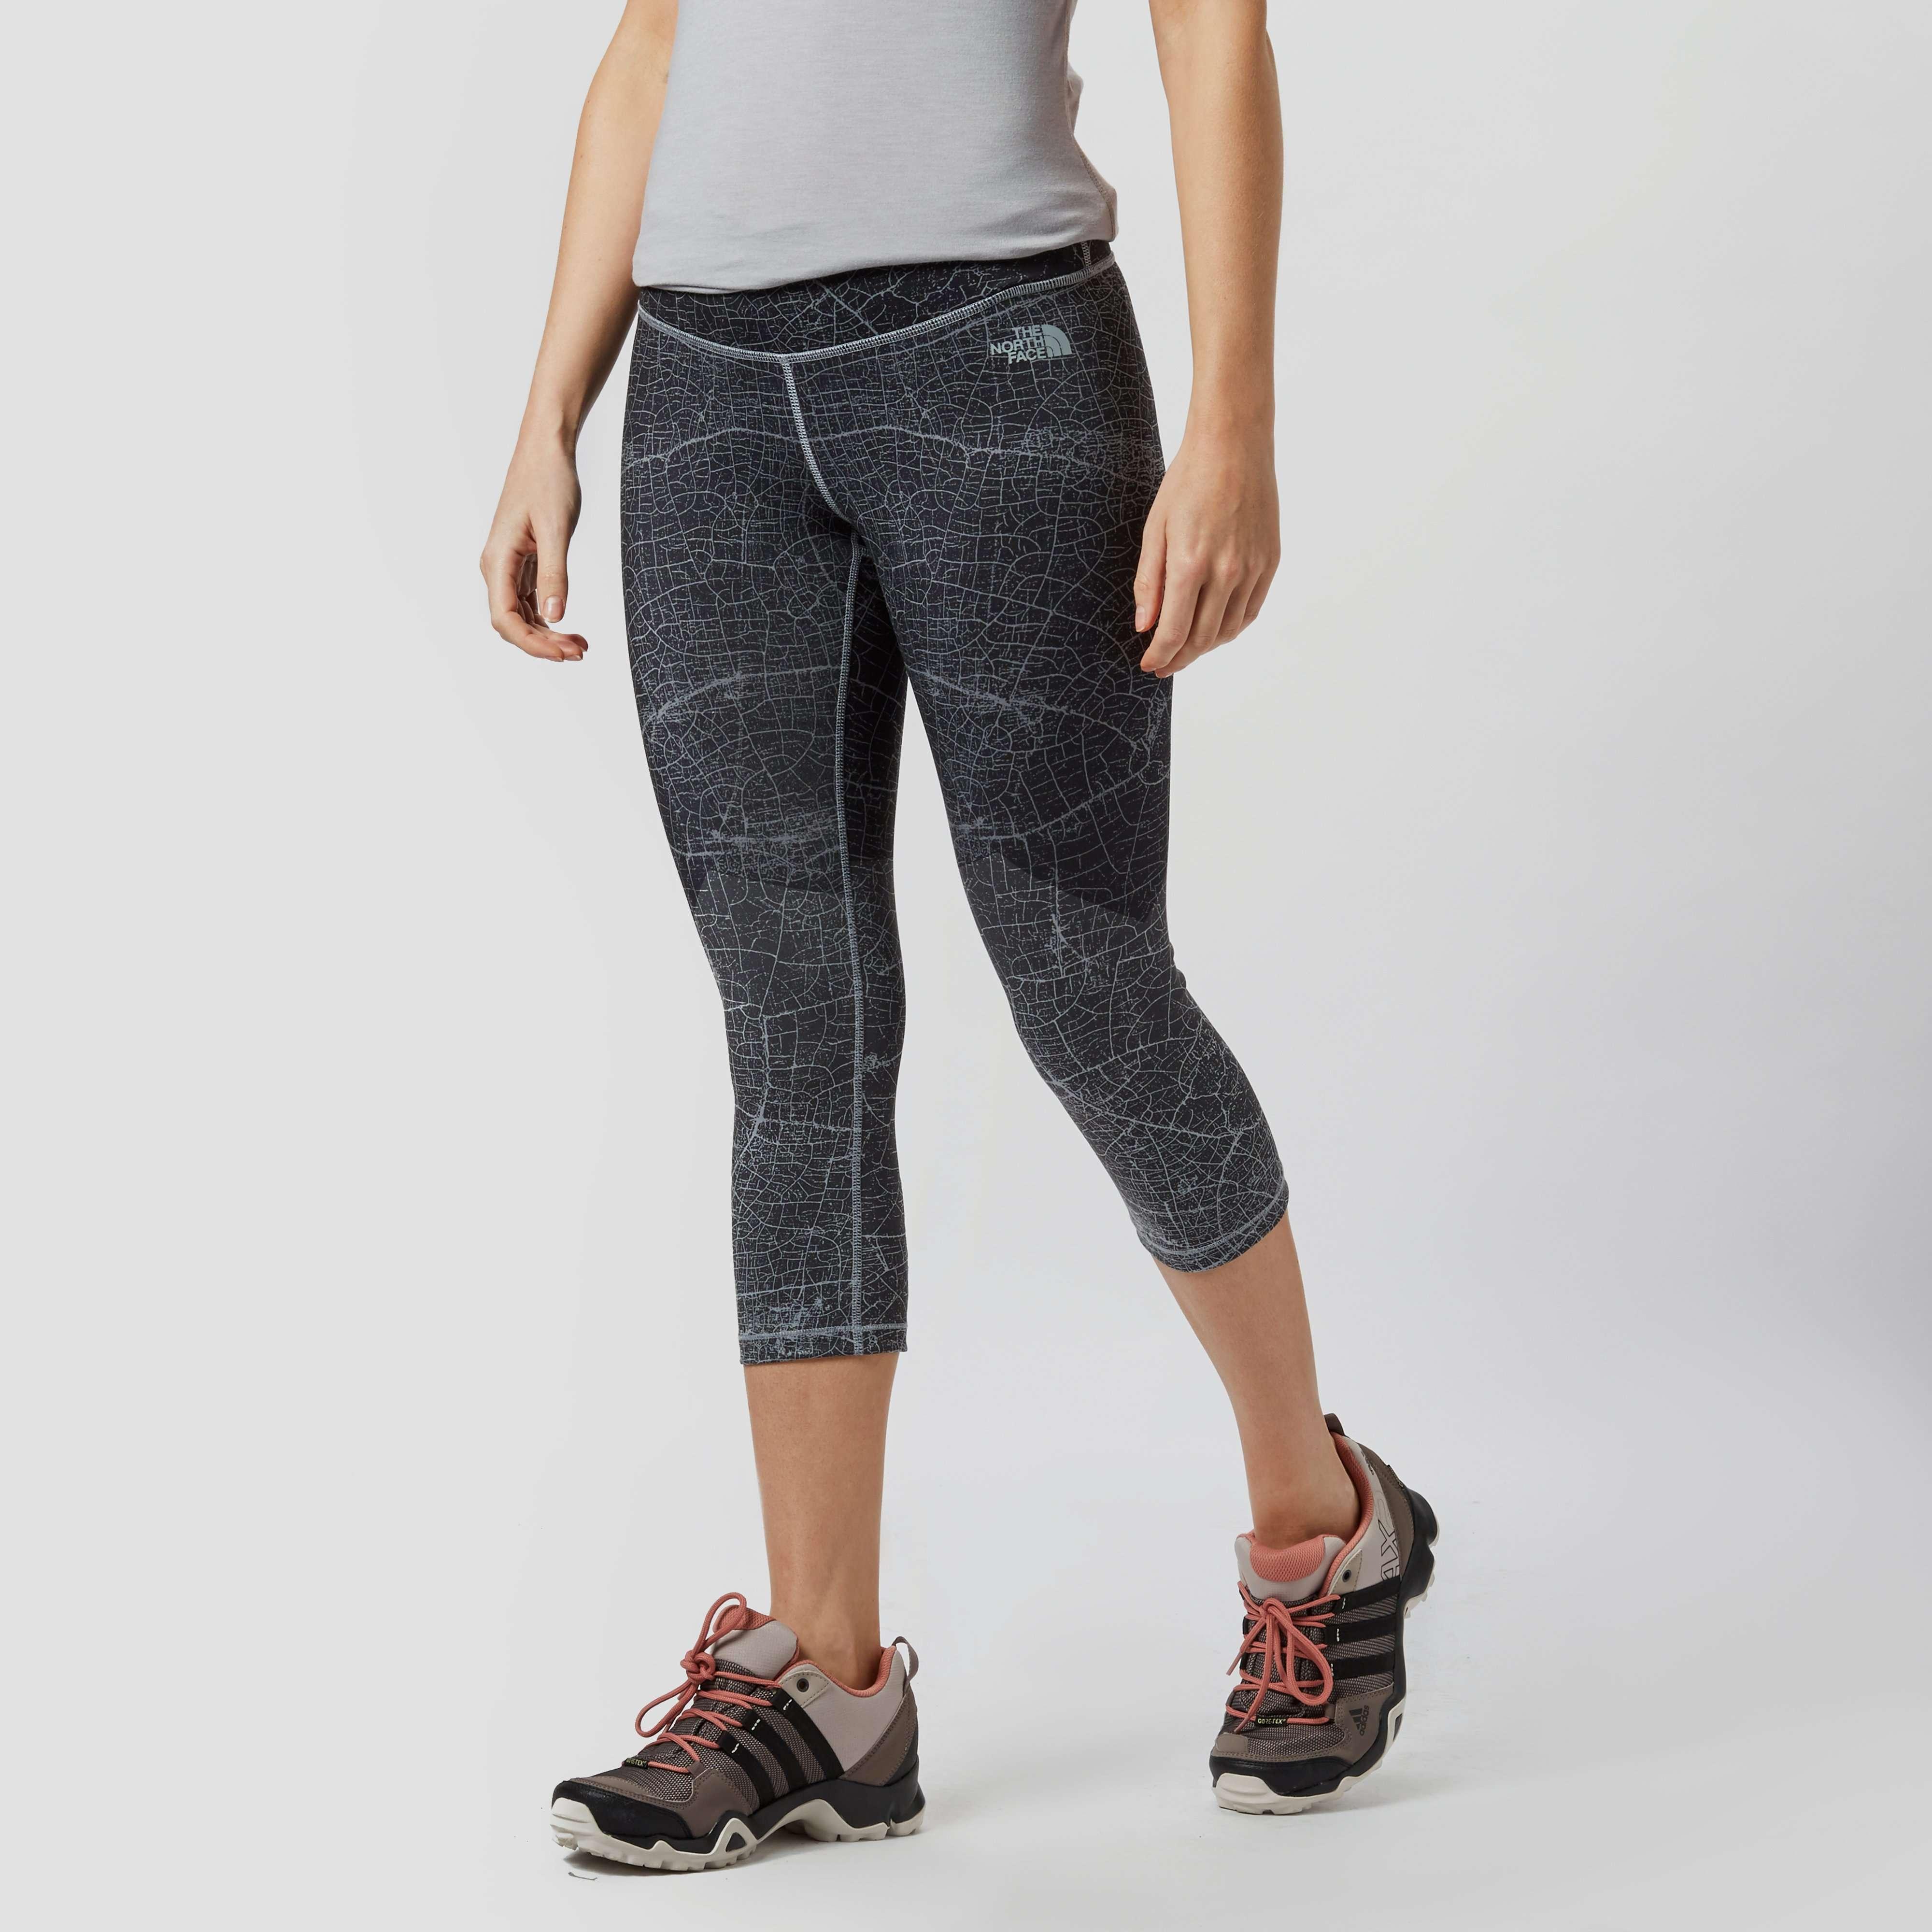 THE NORTH FACE Women's Mountain Athletics Motivation Capri Leggings